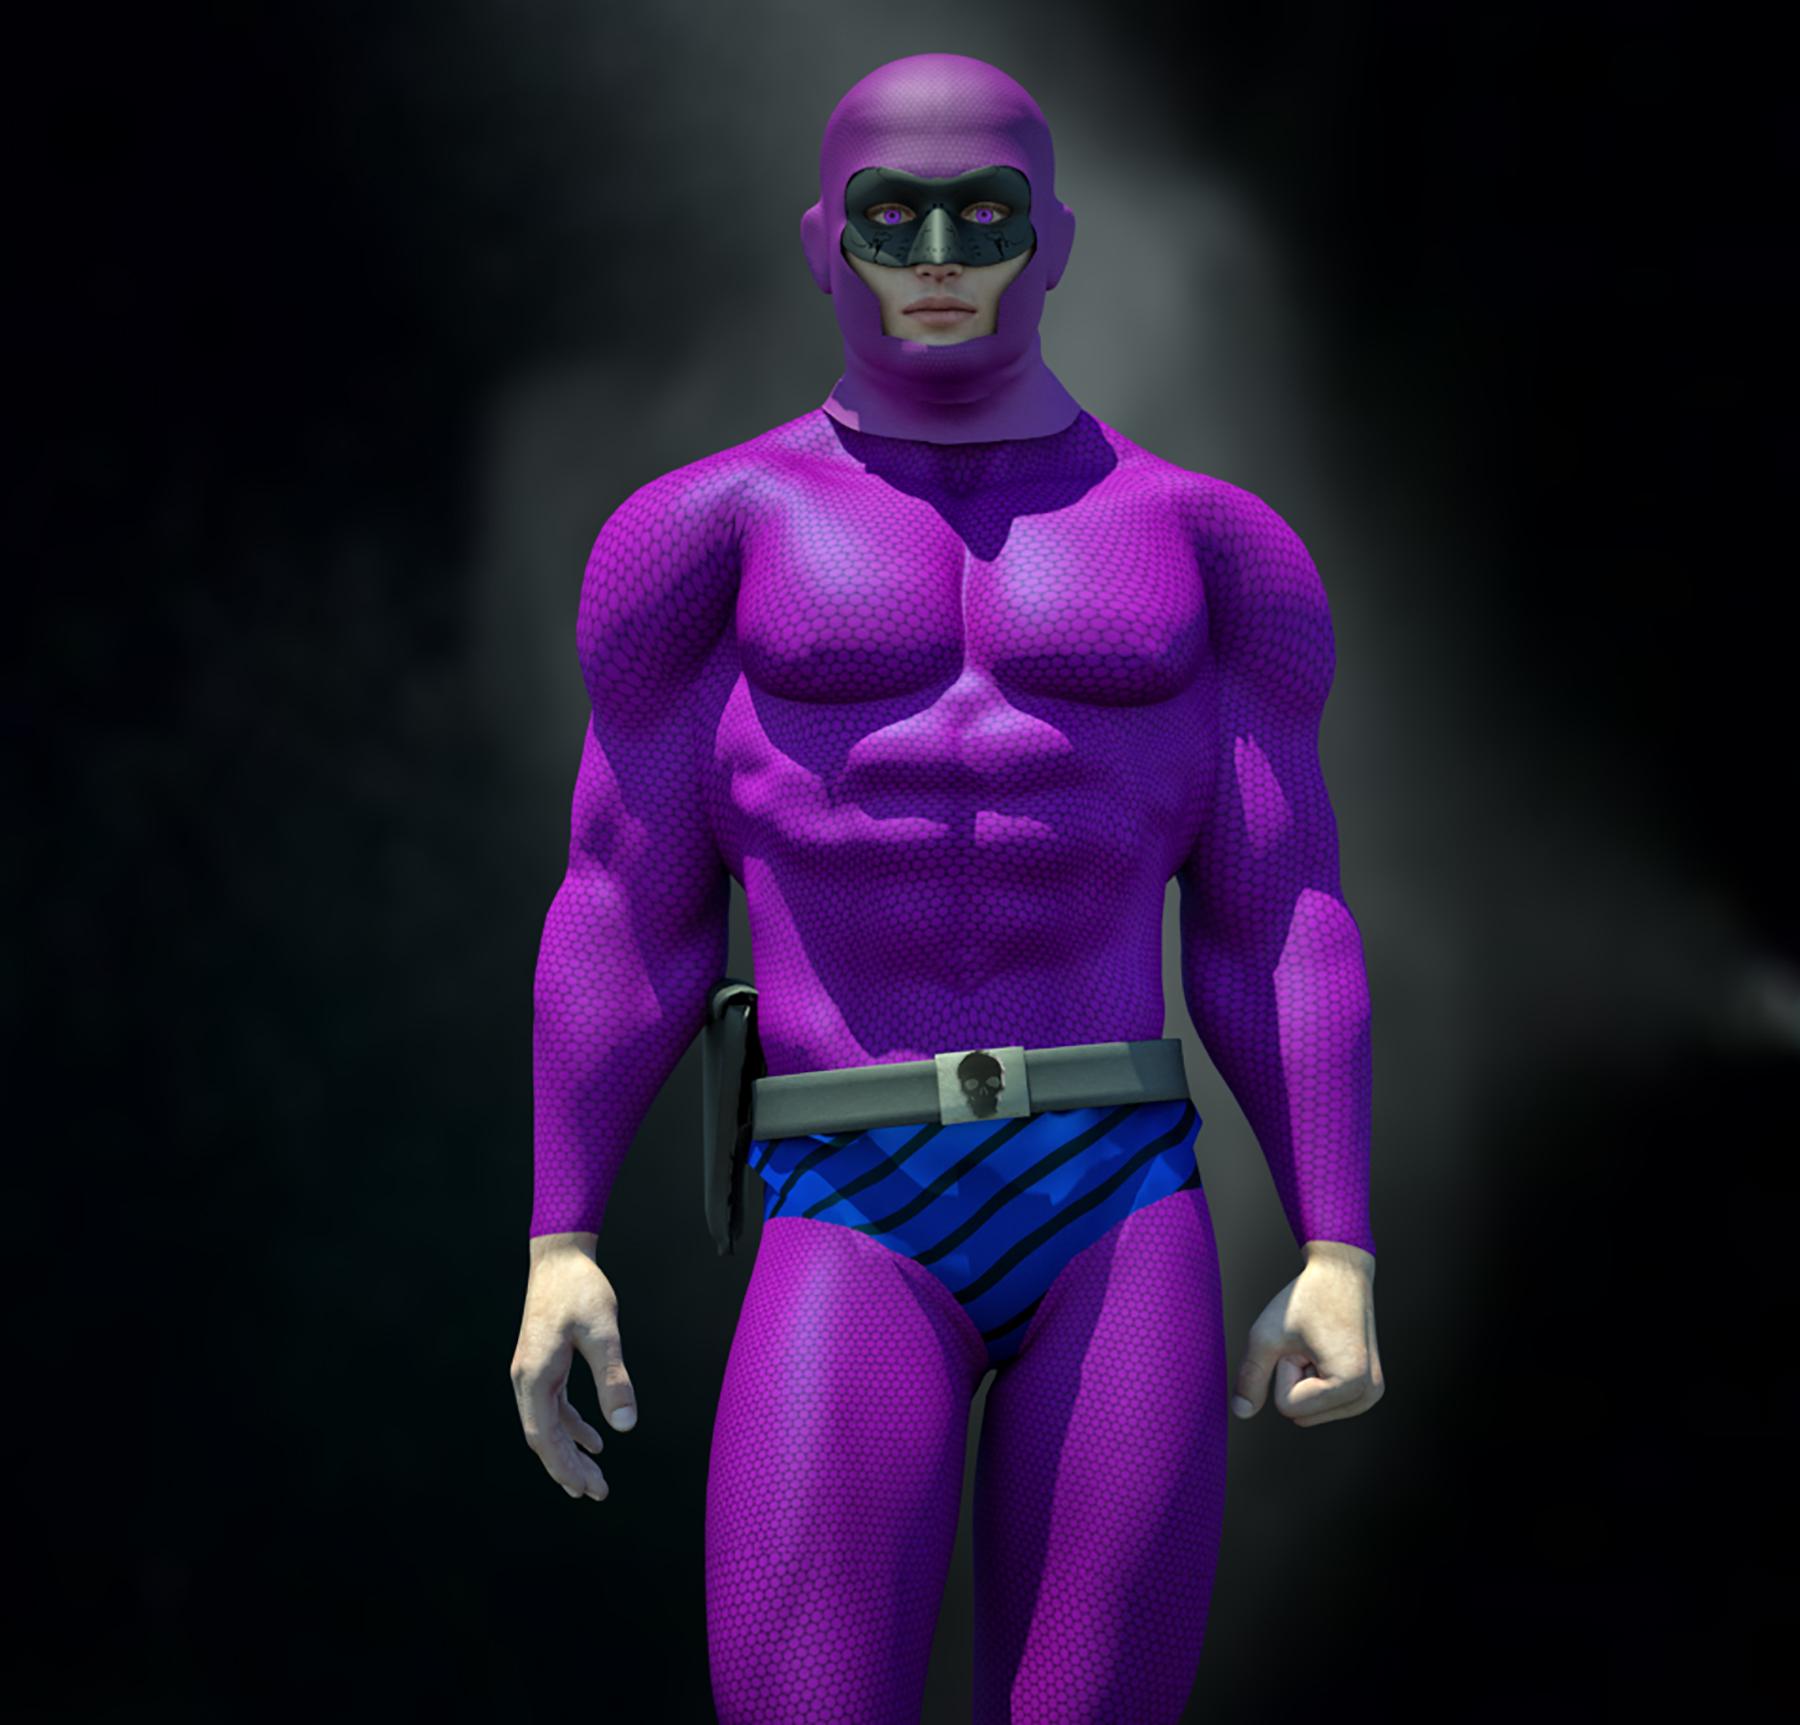 The Phantom 2nd skin textures x M4